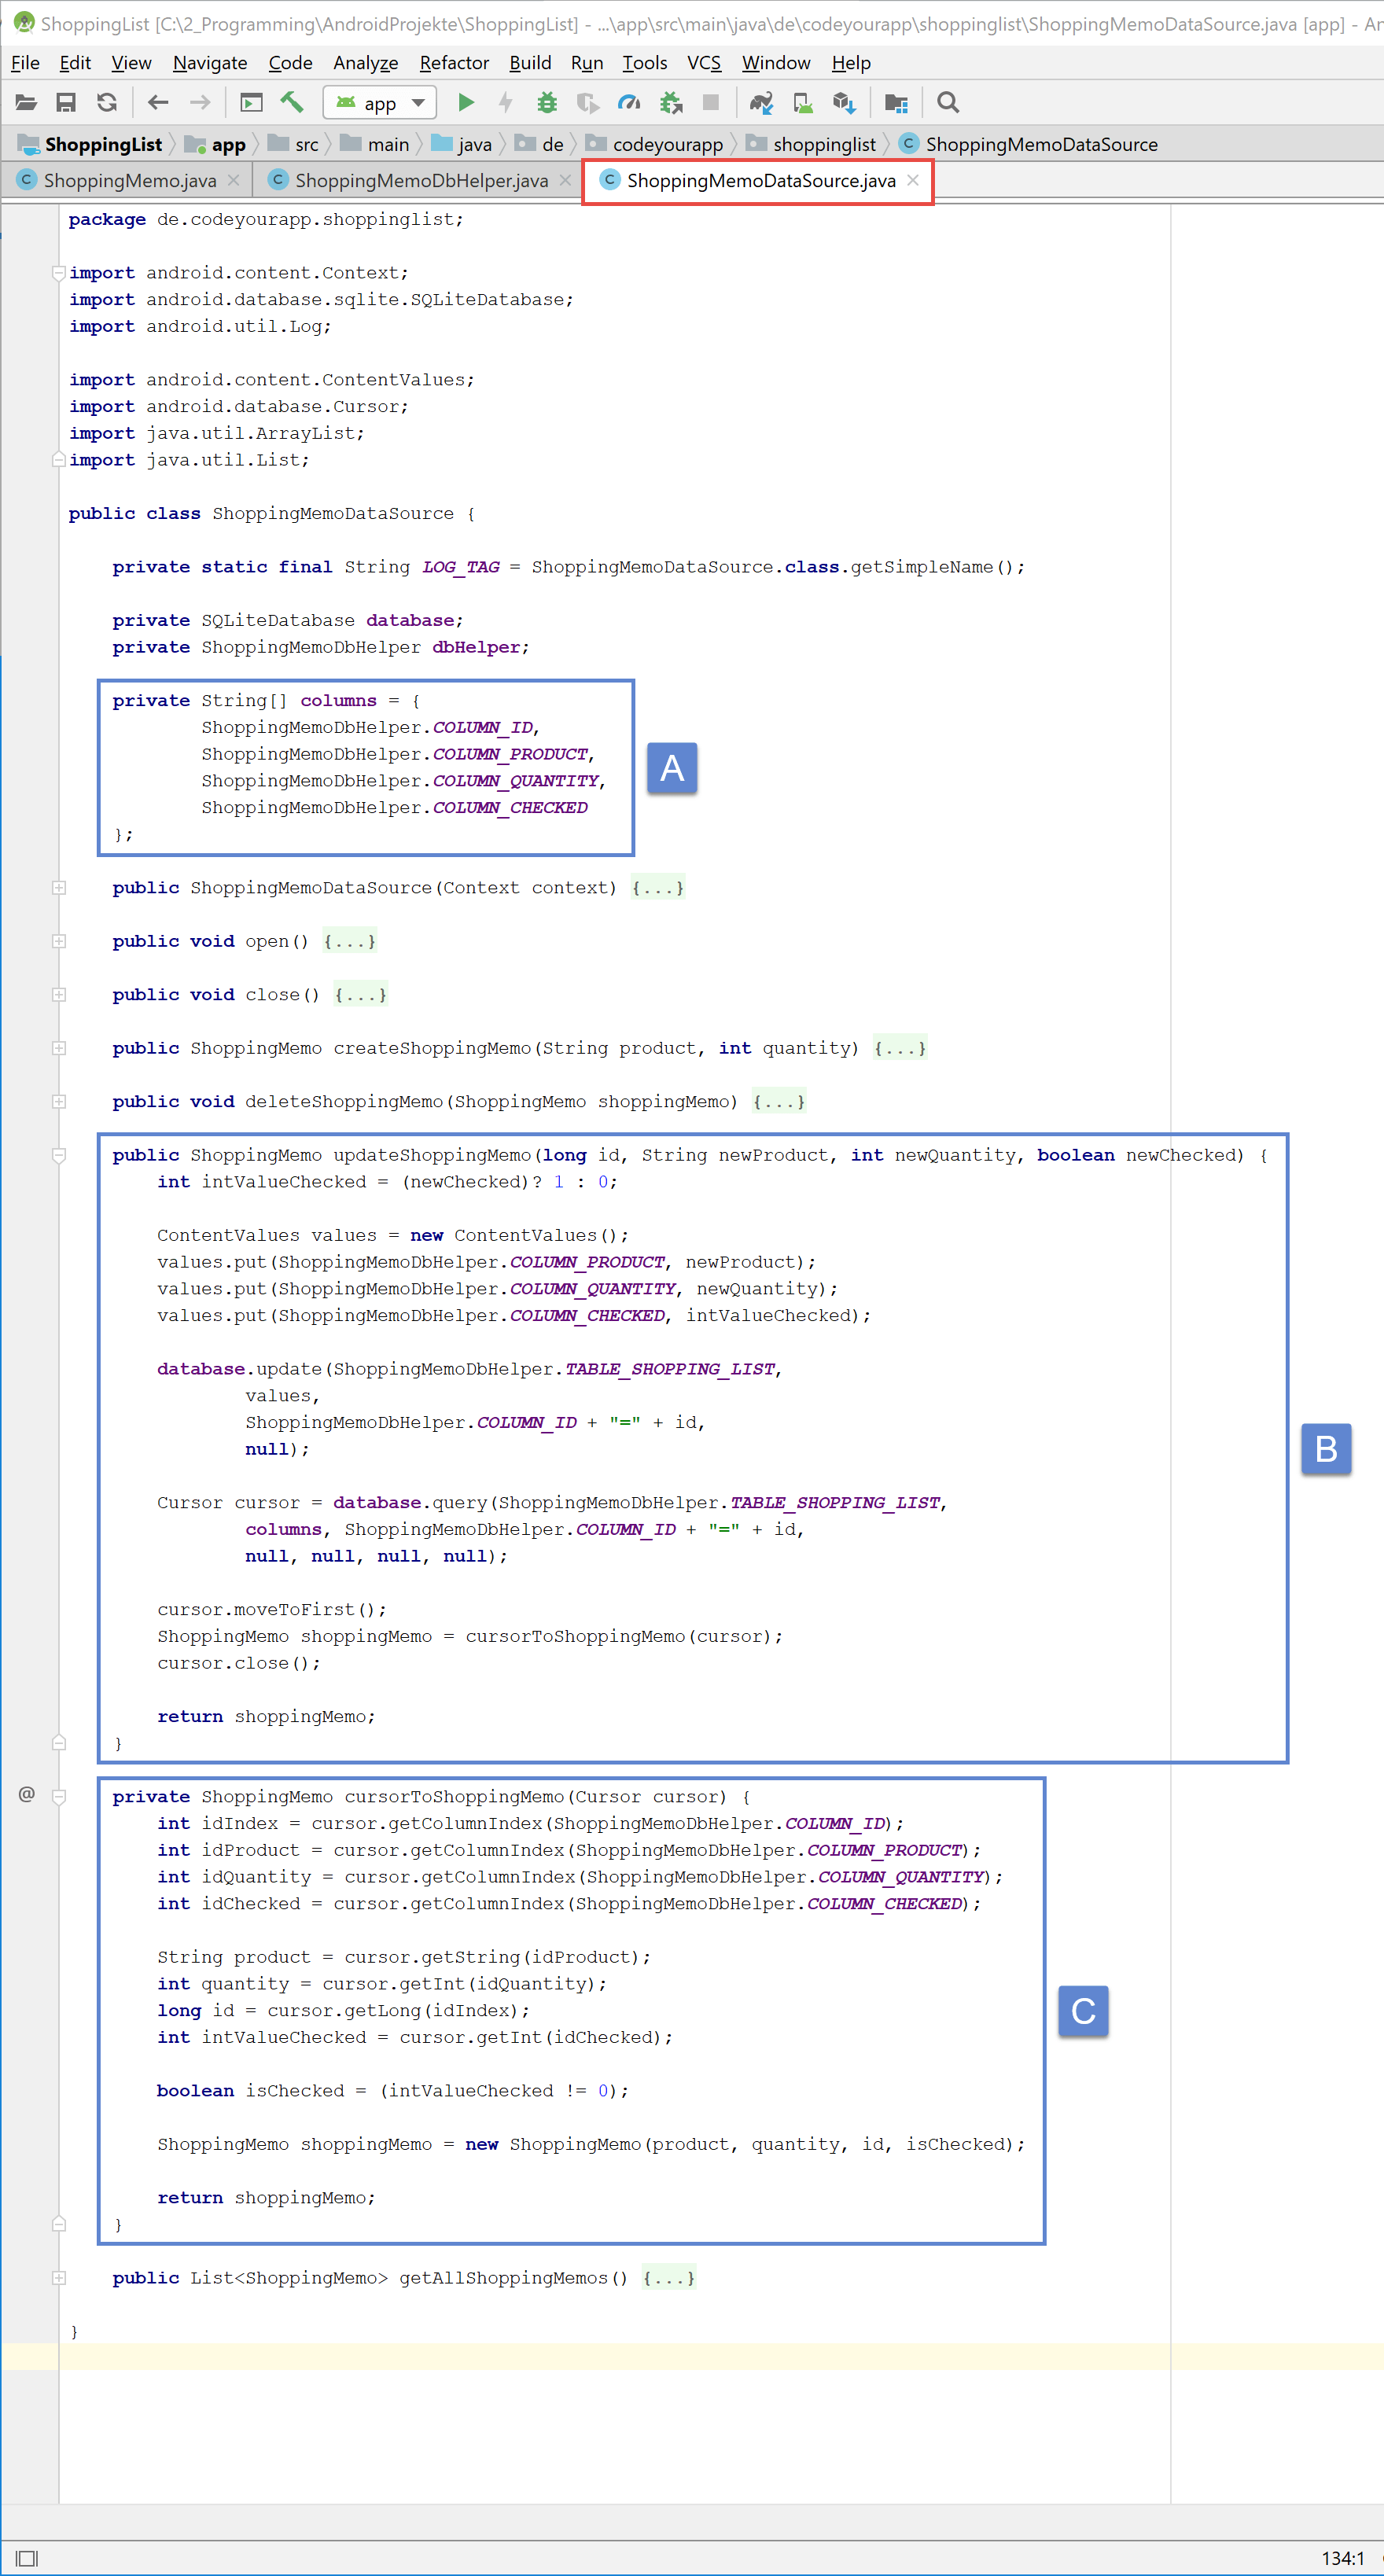 android_sqlite_upgrade_data